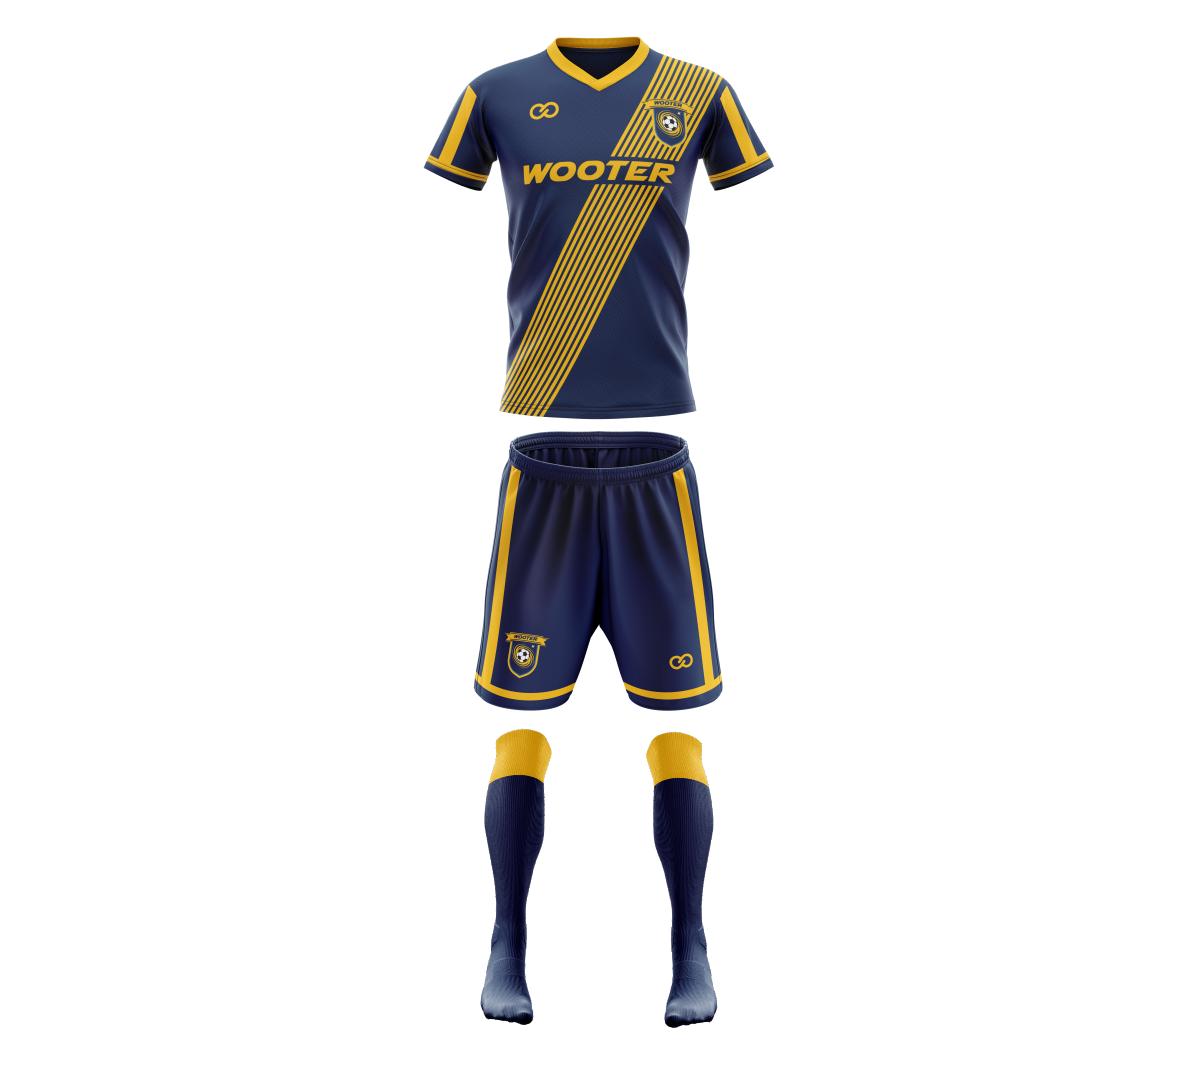 Soccer Uniform (with Socks)